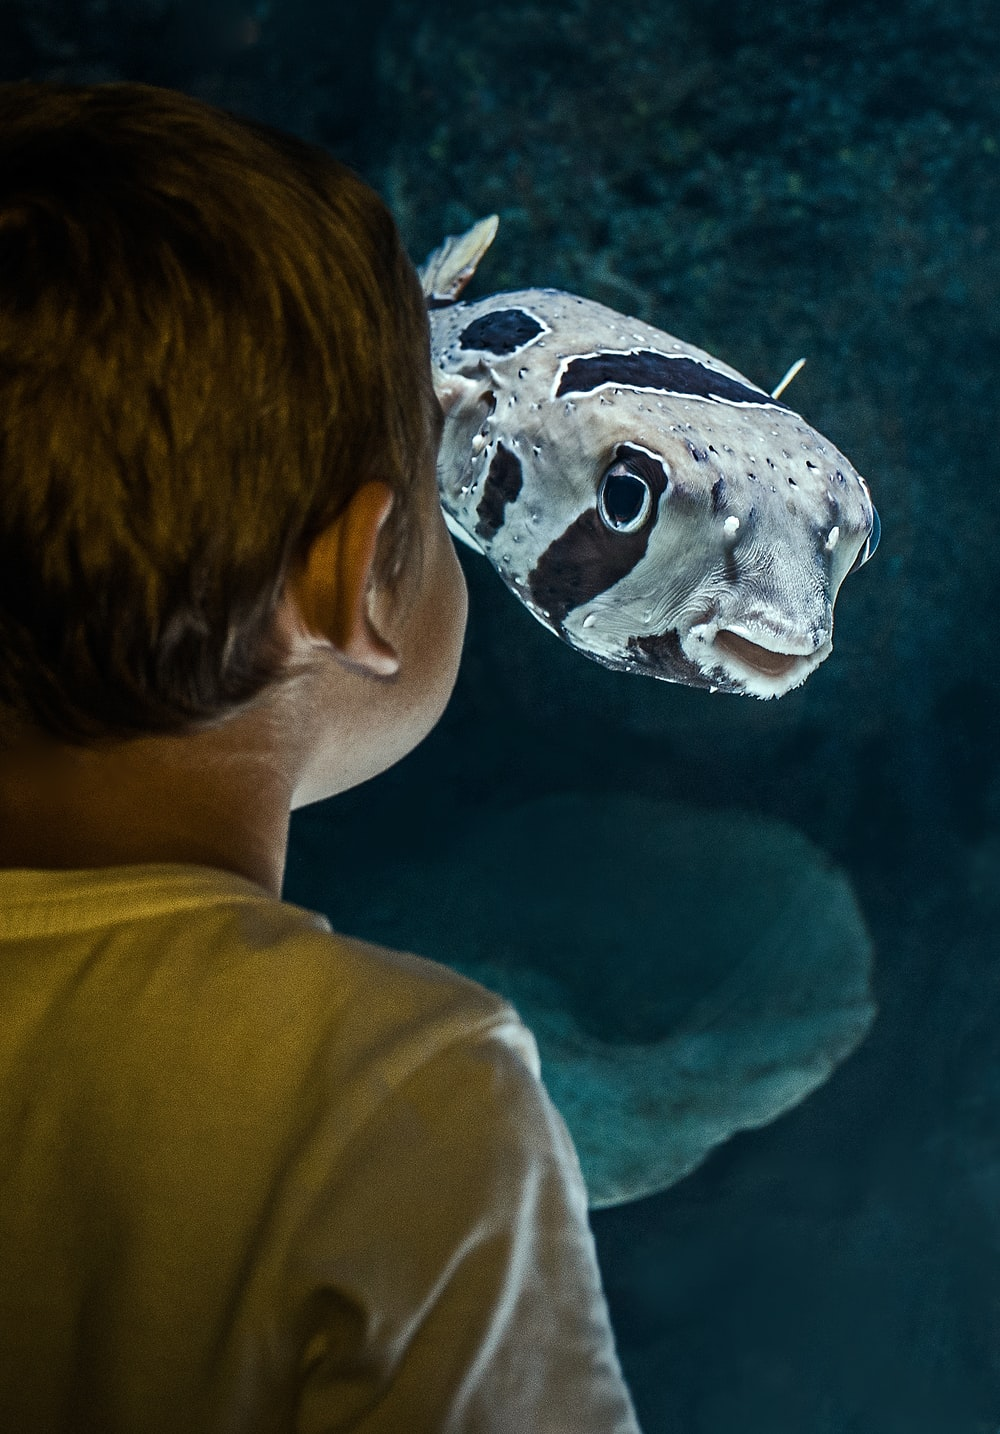 boy standing beside fish inside room